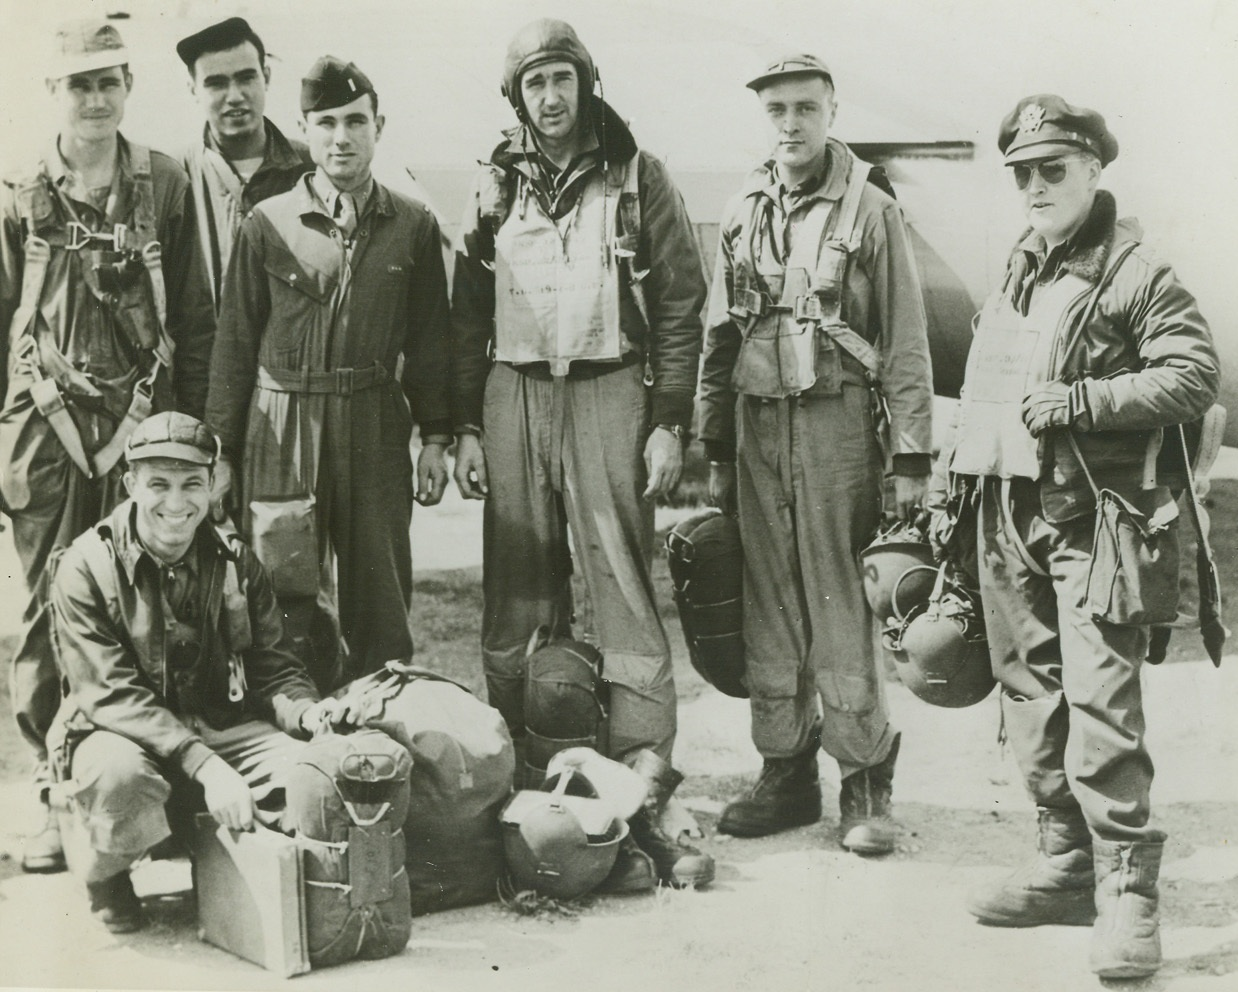 Back from Raid on Alsace Lorraine, 8/22/1944. England – American airmen return to their base in England after raiding targets in Alsace Lorraine. They are (left to right): S/Sgt. Henry L. Wolf, Coahoma, Texas; Sgt. Burdette E. Bonner, Galesburg, Illinois; S/Sgt. Robert B. Linnemann (stooping), Cincinnati, Ohio; 2nd Lt. Burnett L. Deyerle, Roanoke, Virginia; Joseph R. Lyons, Wooster, Massachusetts; 2nd Lt. Lorne R. Marlatt, Brooklyn, New York; and 1st Lt. Neil A. Daniels, Oak Park, Illinois. Credit: ACME;